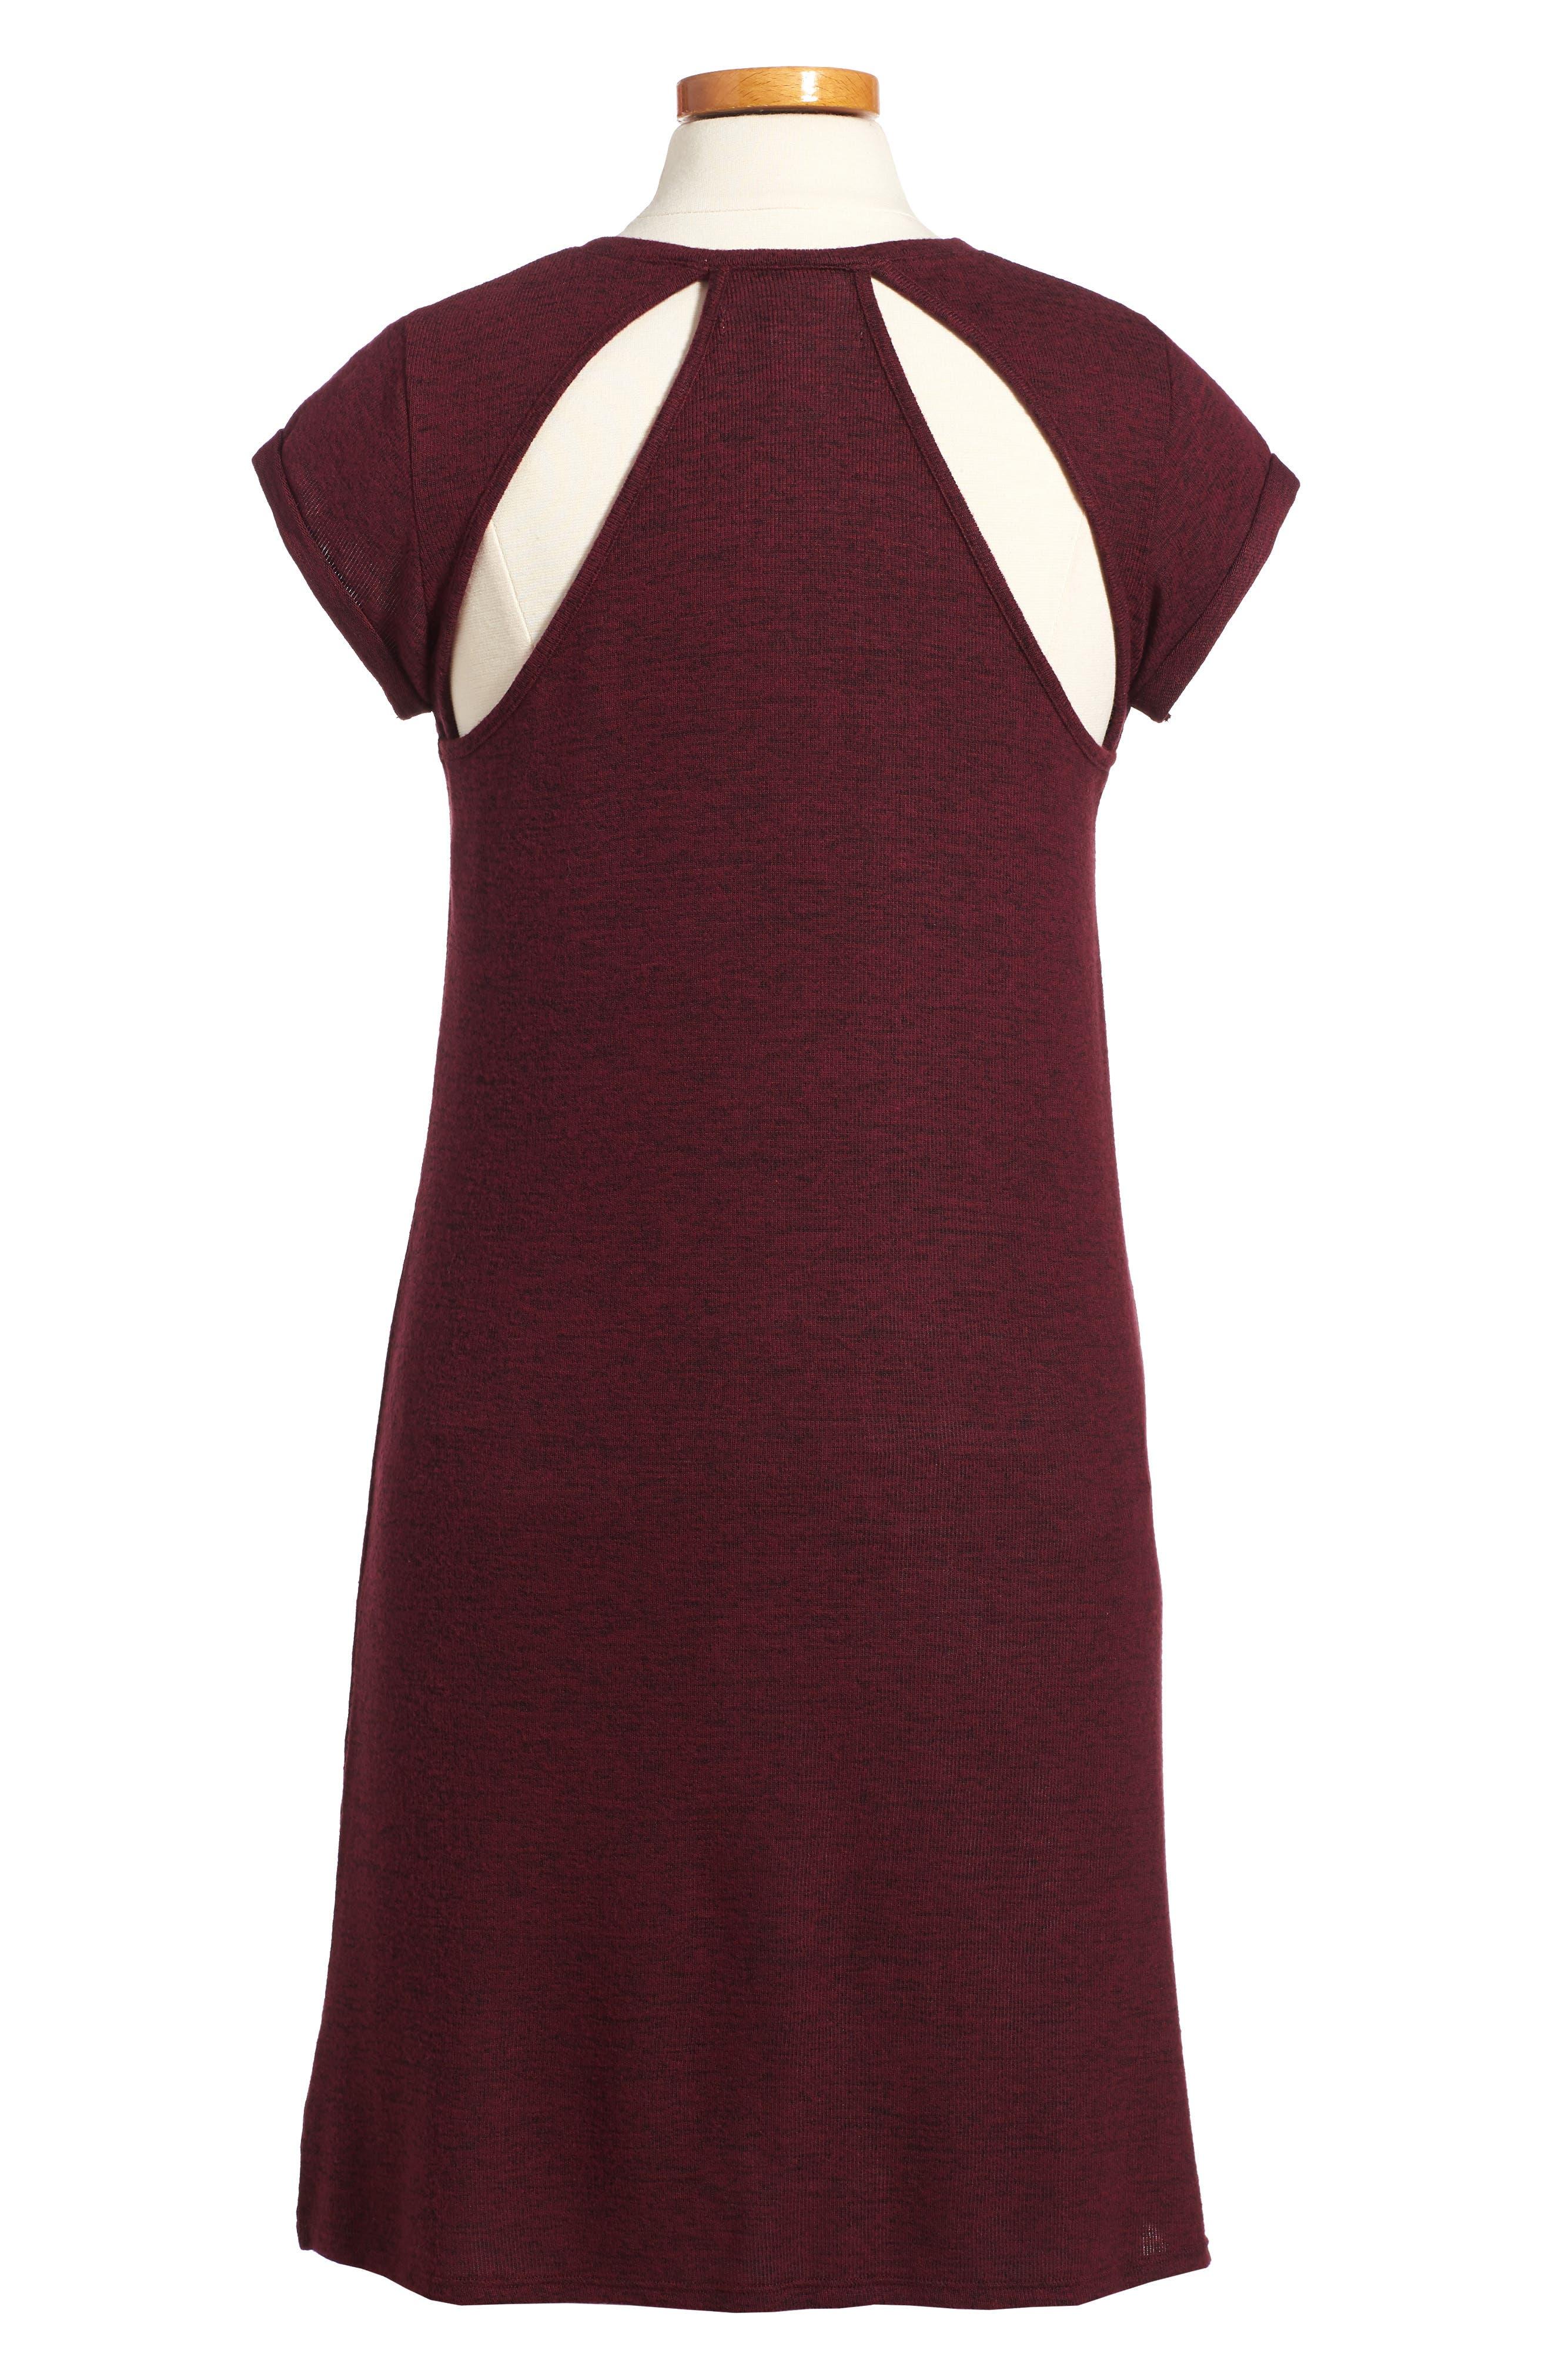 Alternate Image 2  - Treasure & Bond Sneaker Cutout Dress (Big Girls)